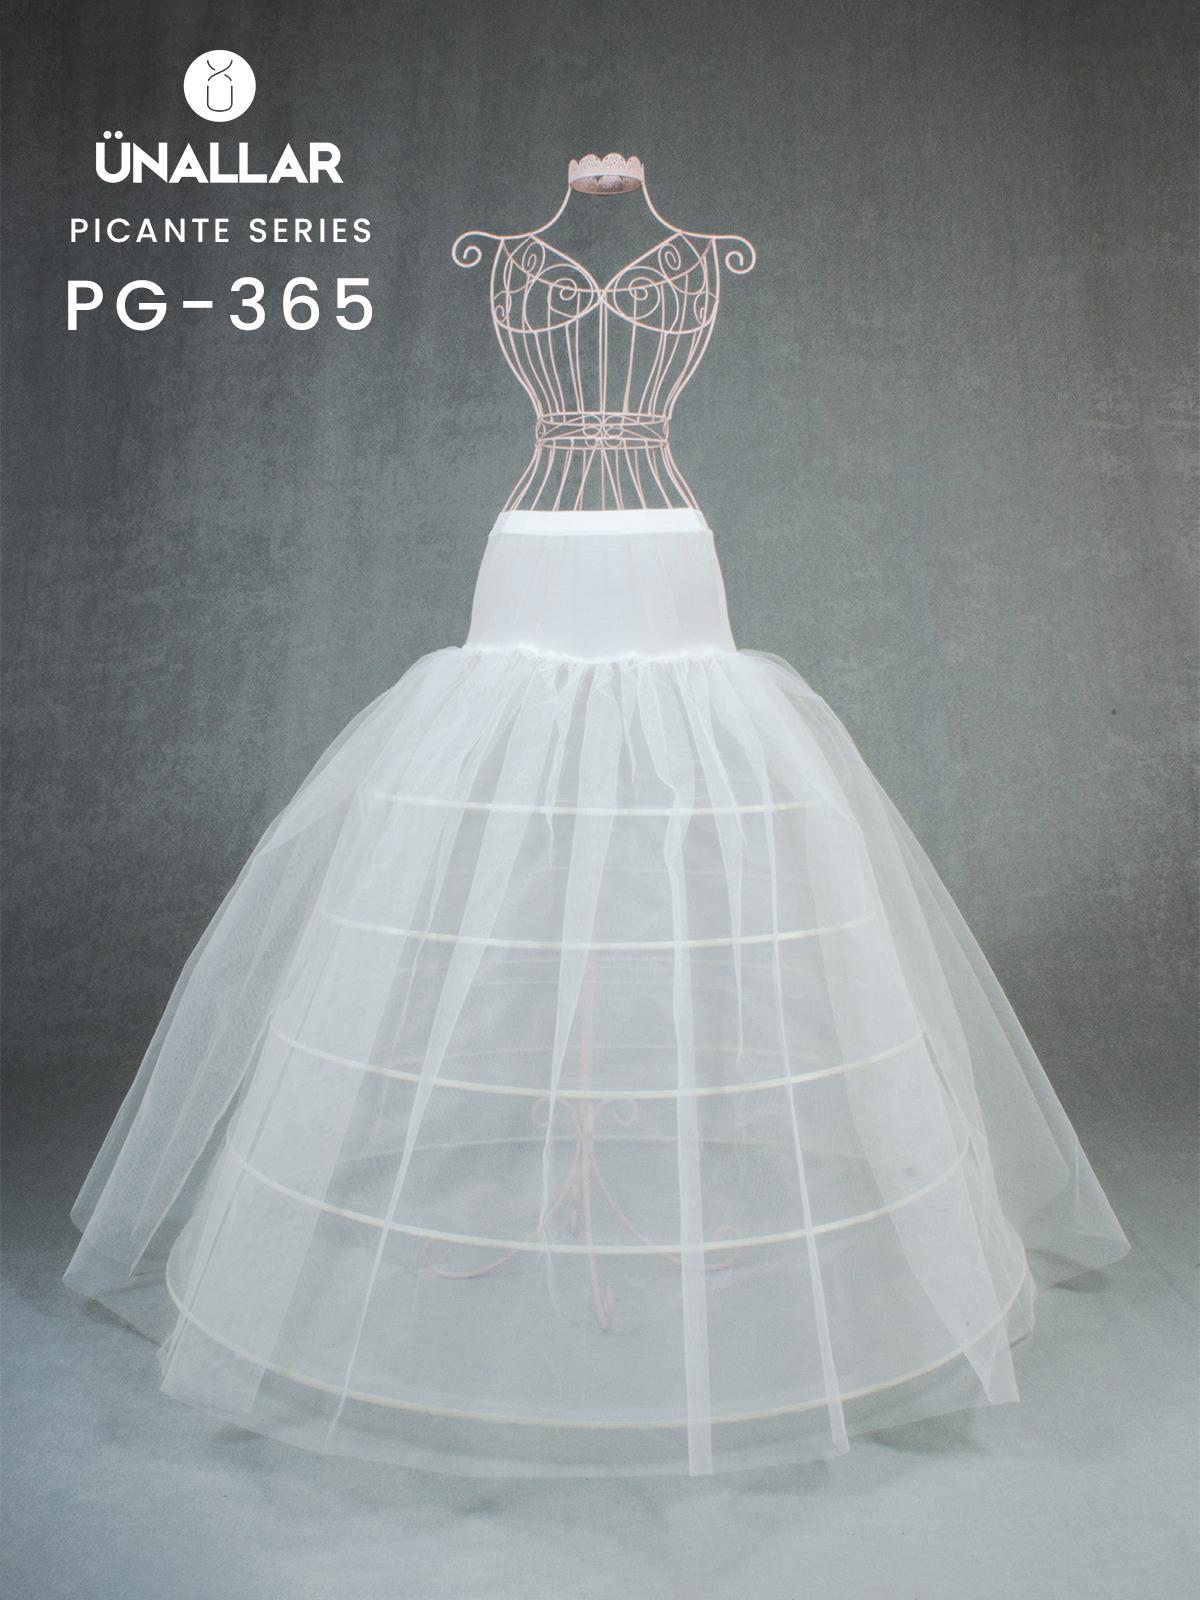 pg-365